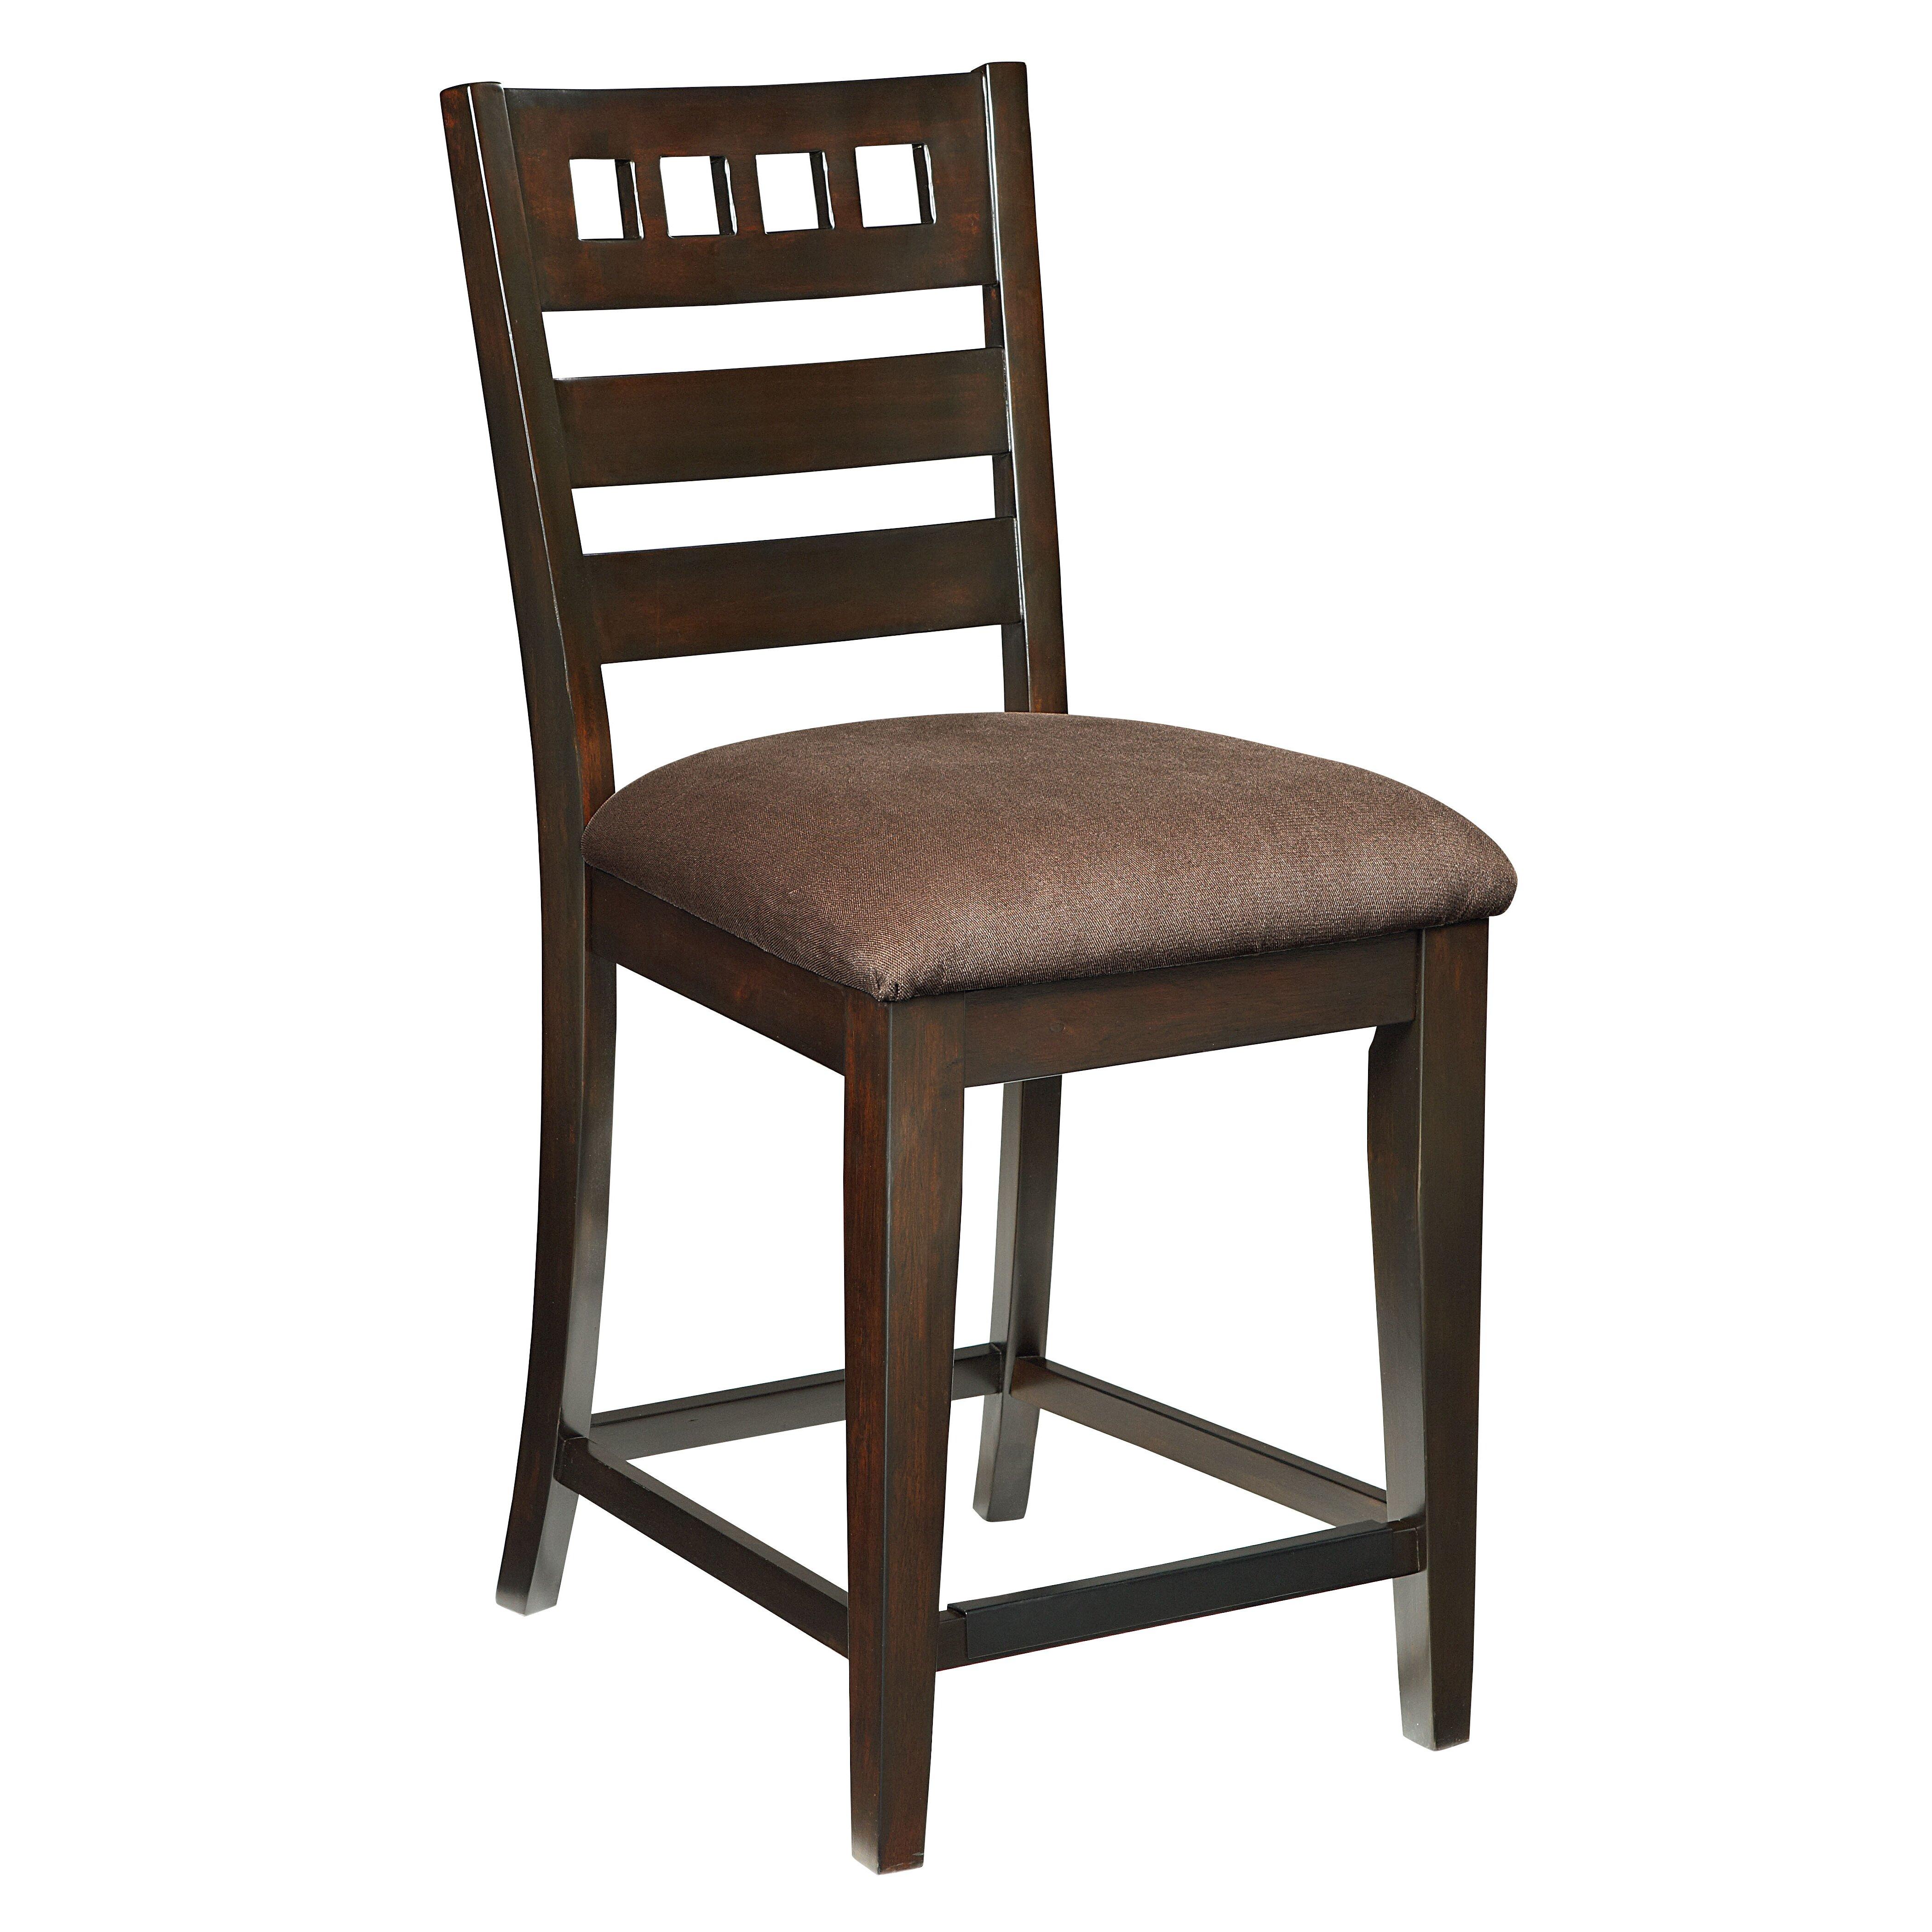 Standard Furniture Sparkle 5 Piece Counter Height Dining Set Reviews Wayfair